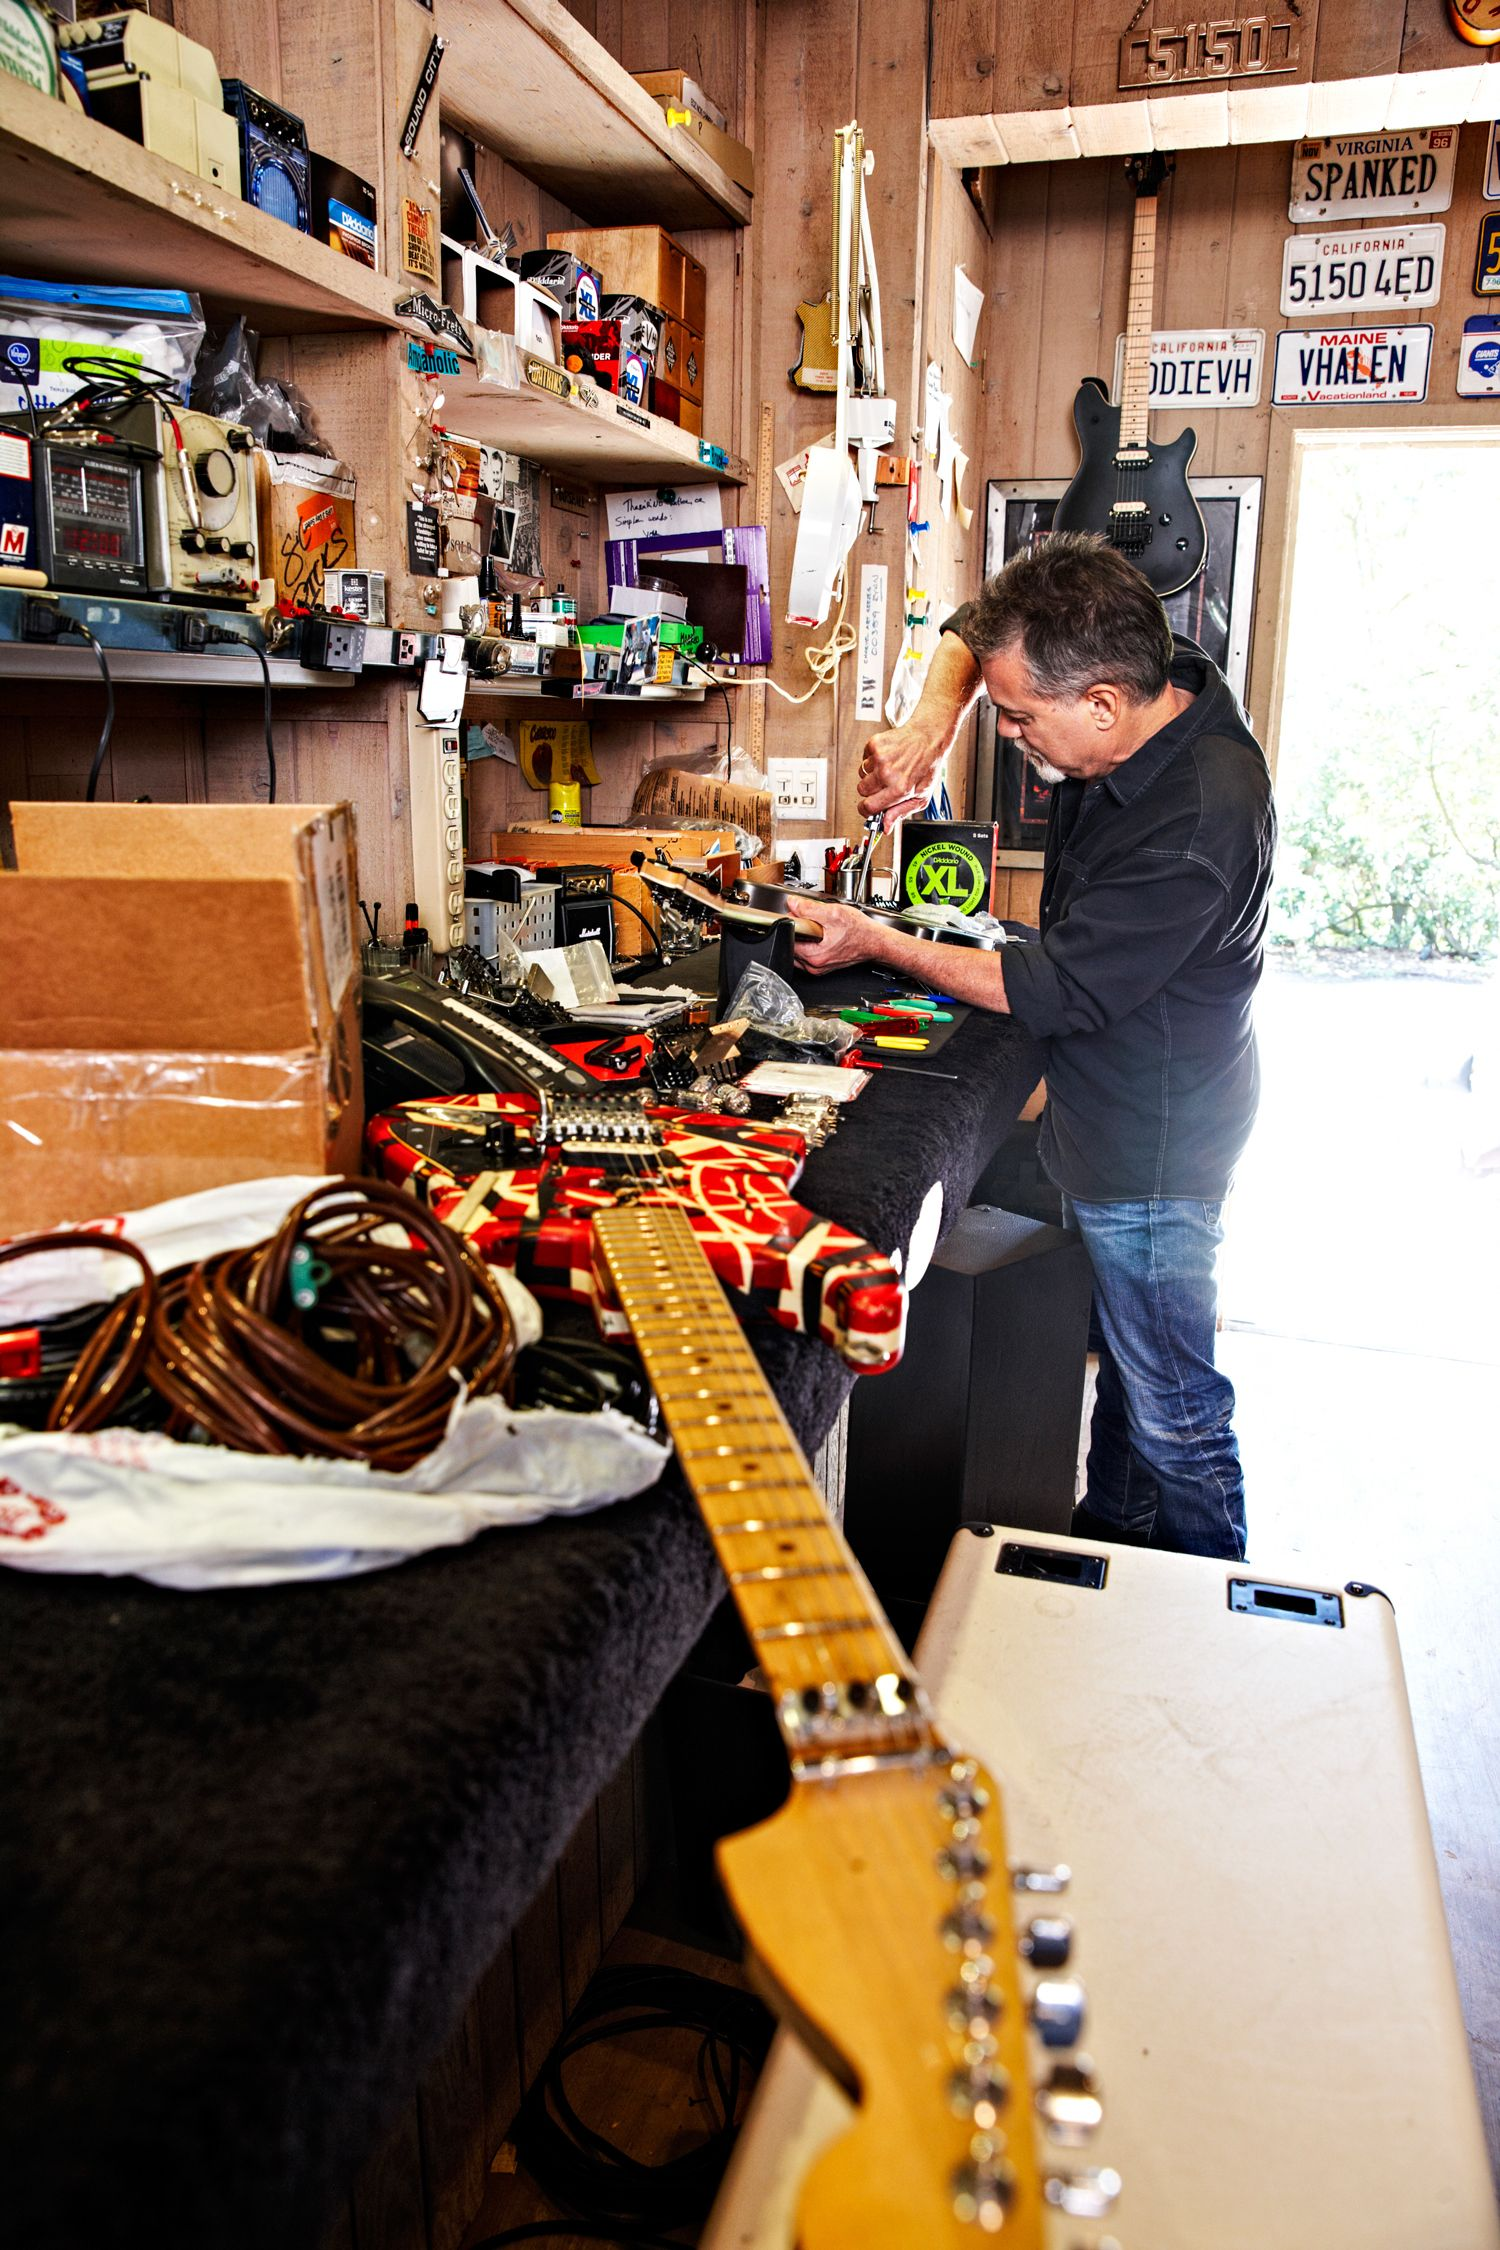 Wiring Diagram For Eddie Van Halen Mark Knopfler How Hacks A Guitar Rh Popularmechanics Com Valerie